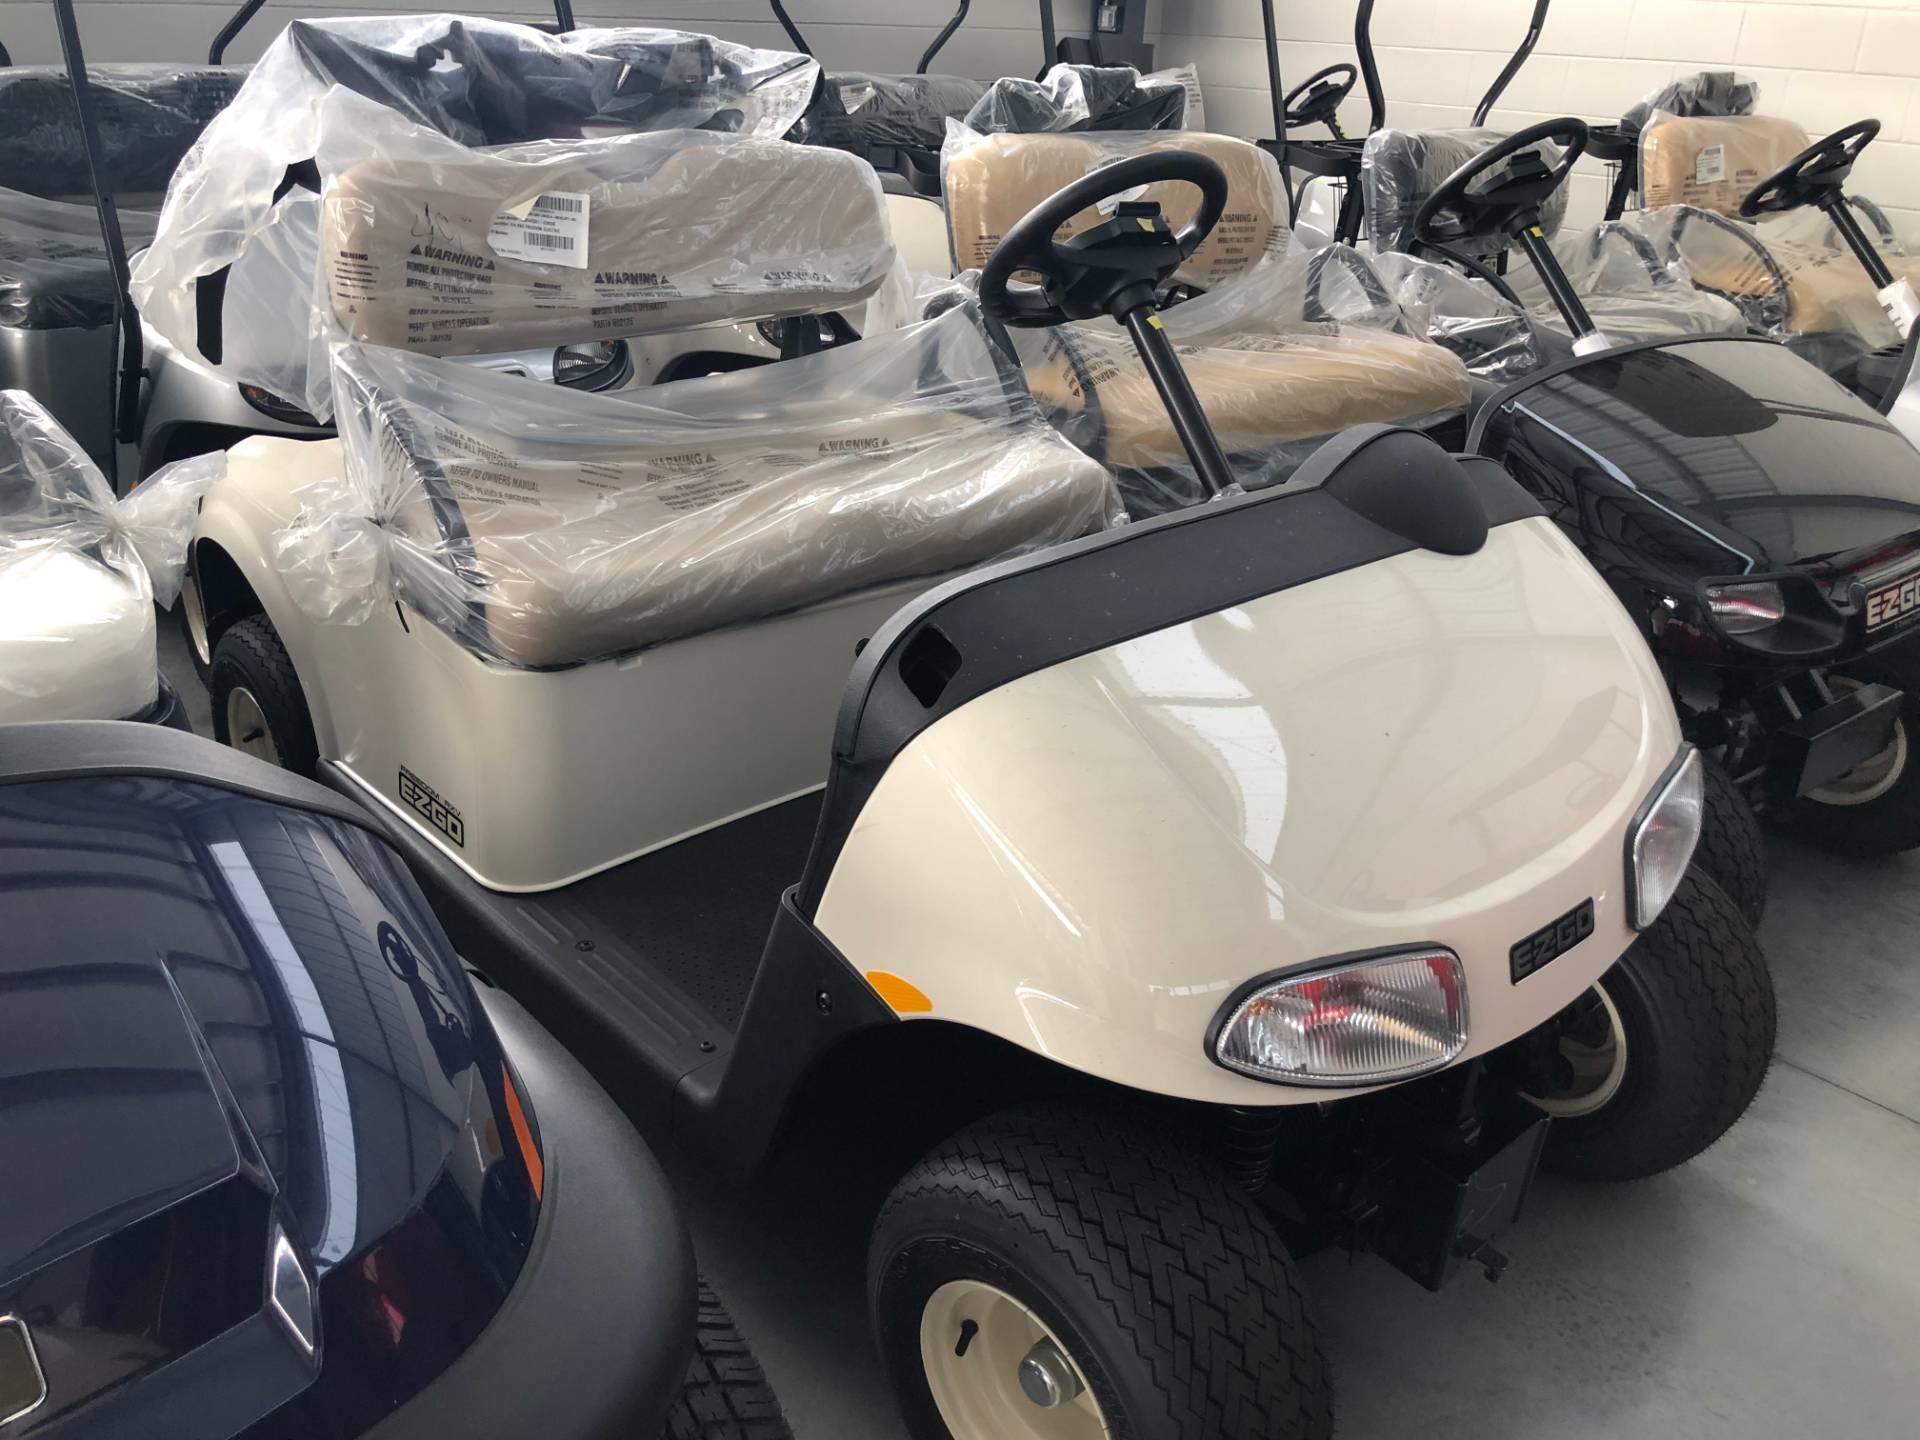 New 2018 E-Z-Go Freedom RXV Electric Golf Carts in Lakeland, FL ...